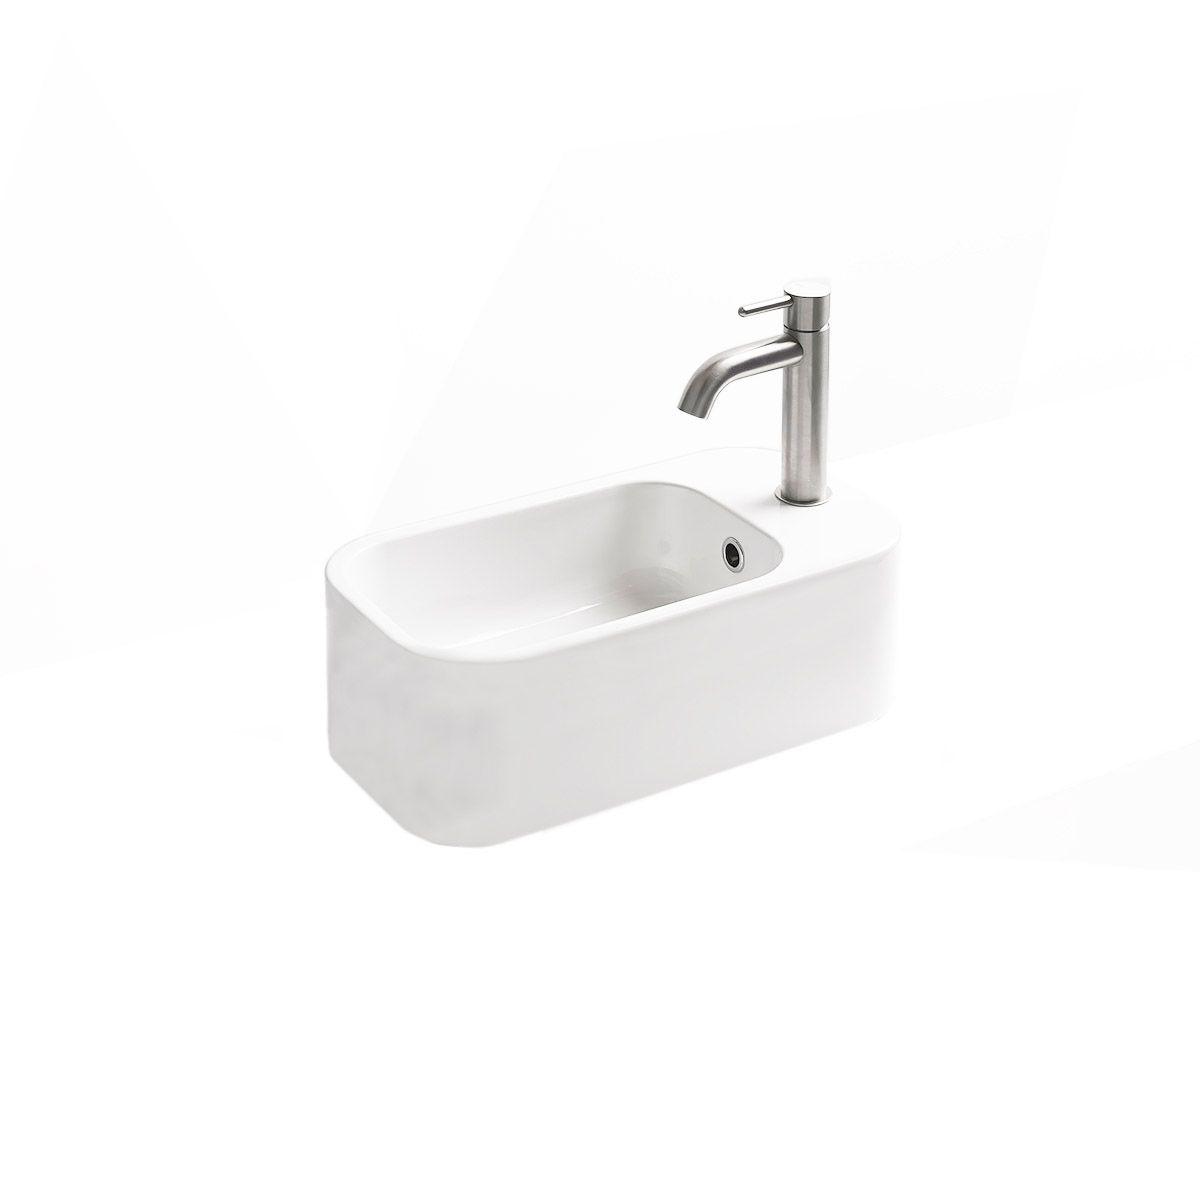 ws bath collections cosa mini 48f small wall mounted vessel bathroom sink 18 9